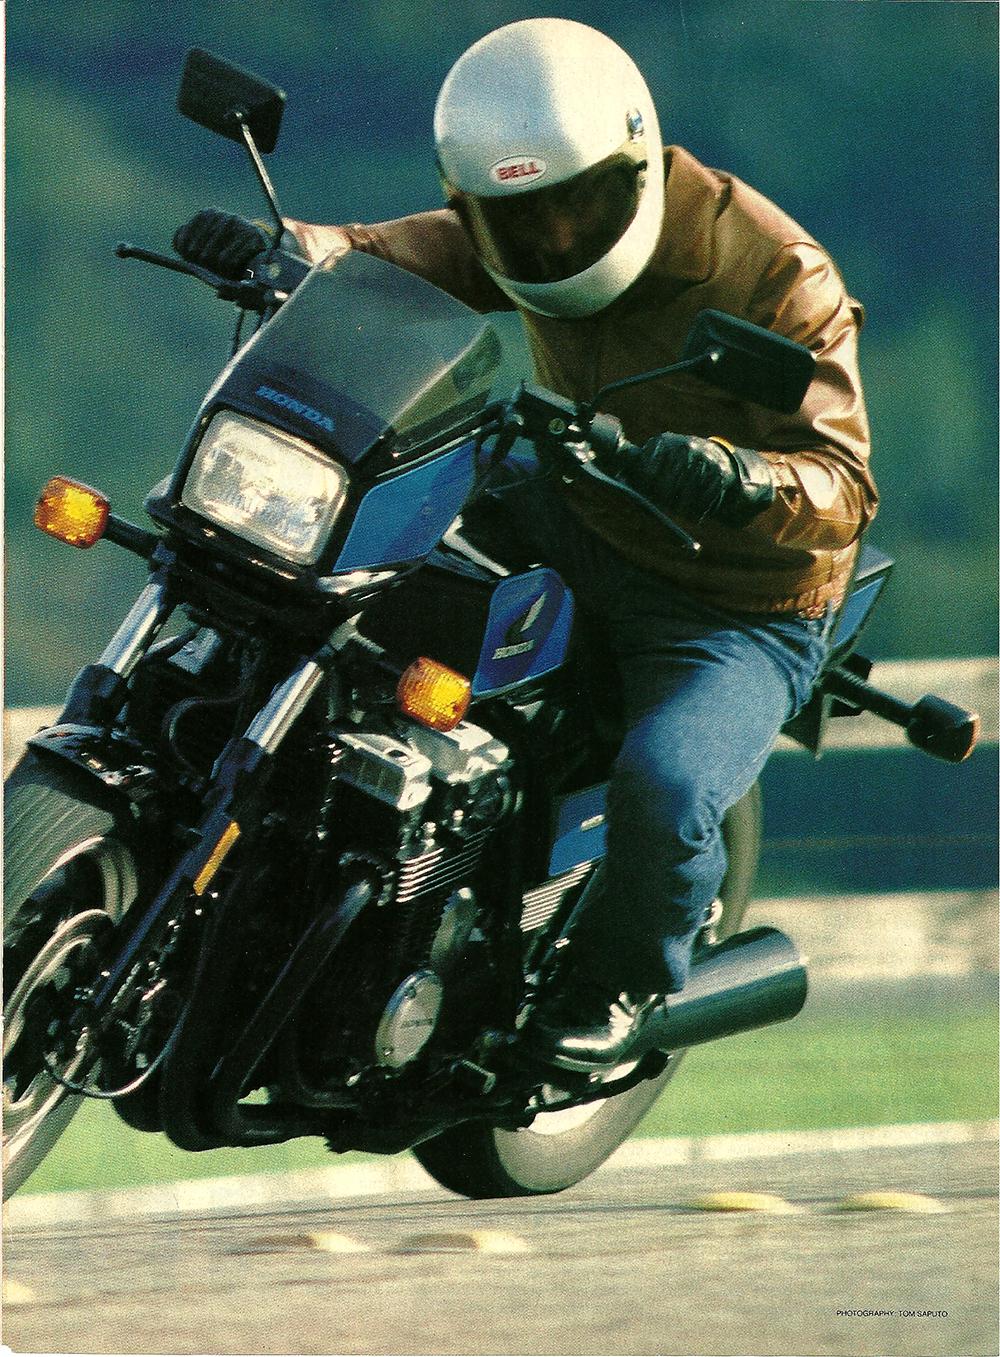 1984 Honda CB700SC Nighthawk S road test 2.jpg